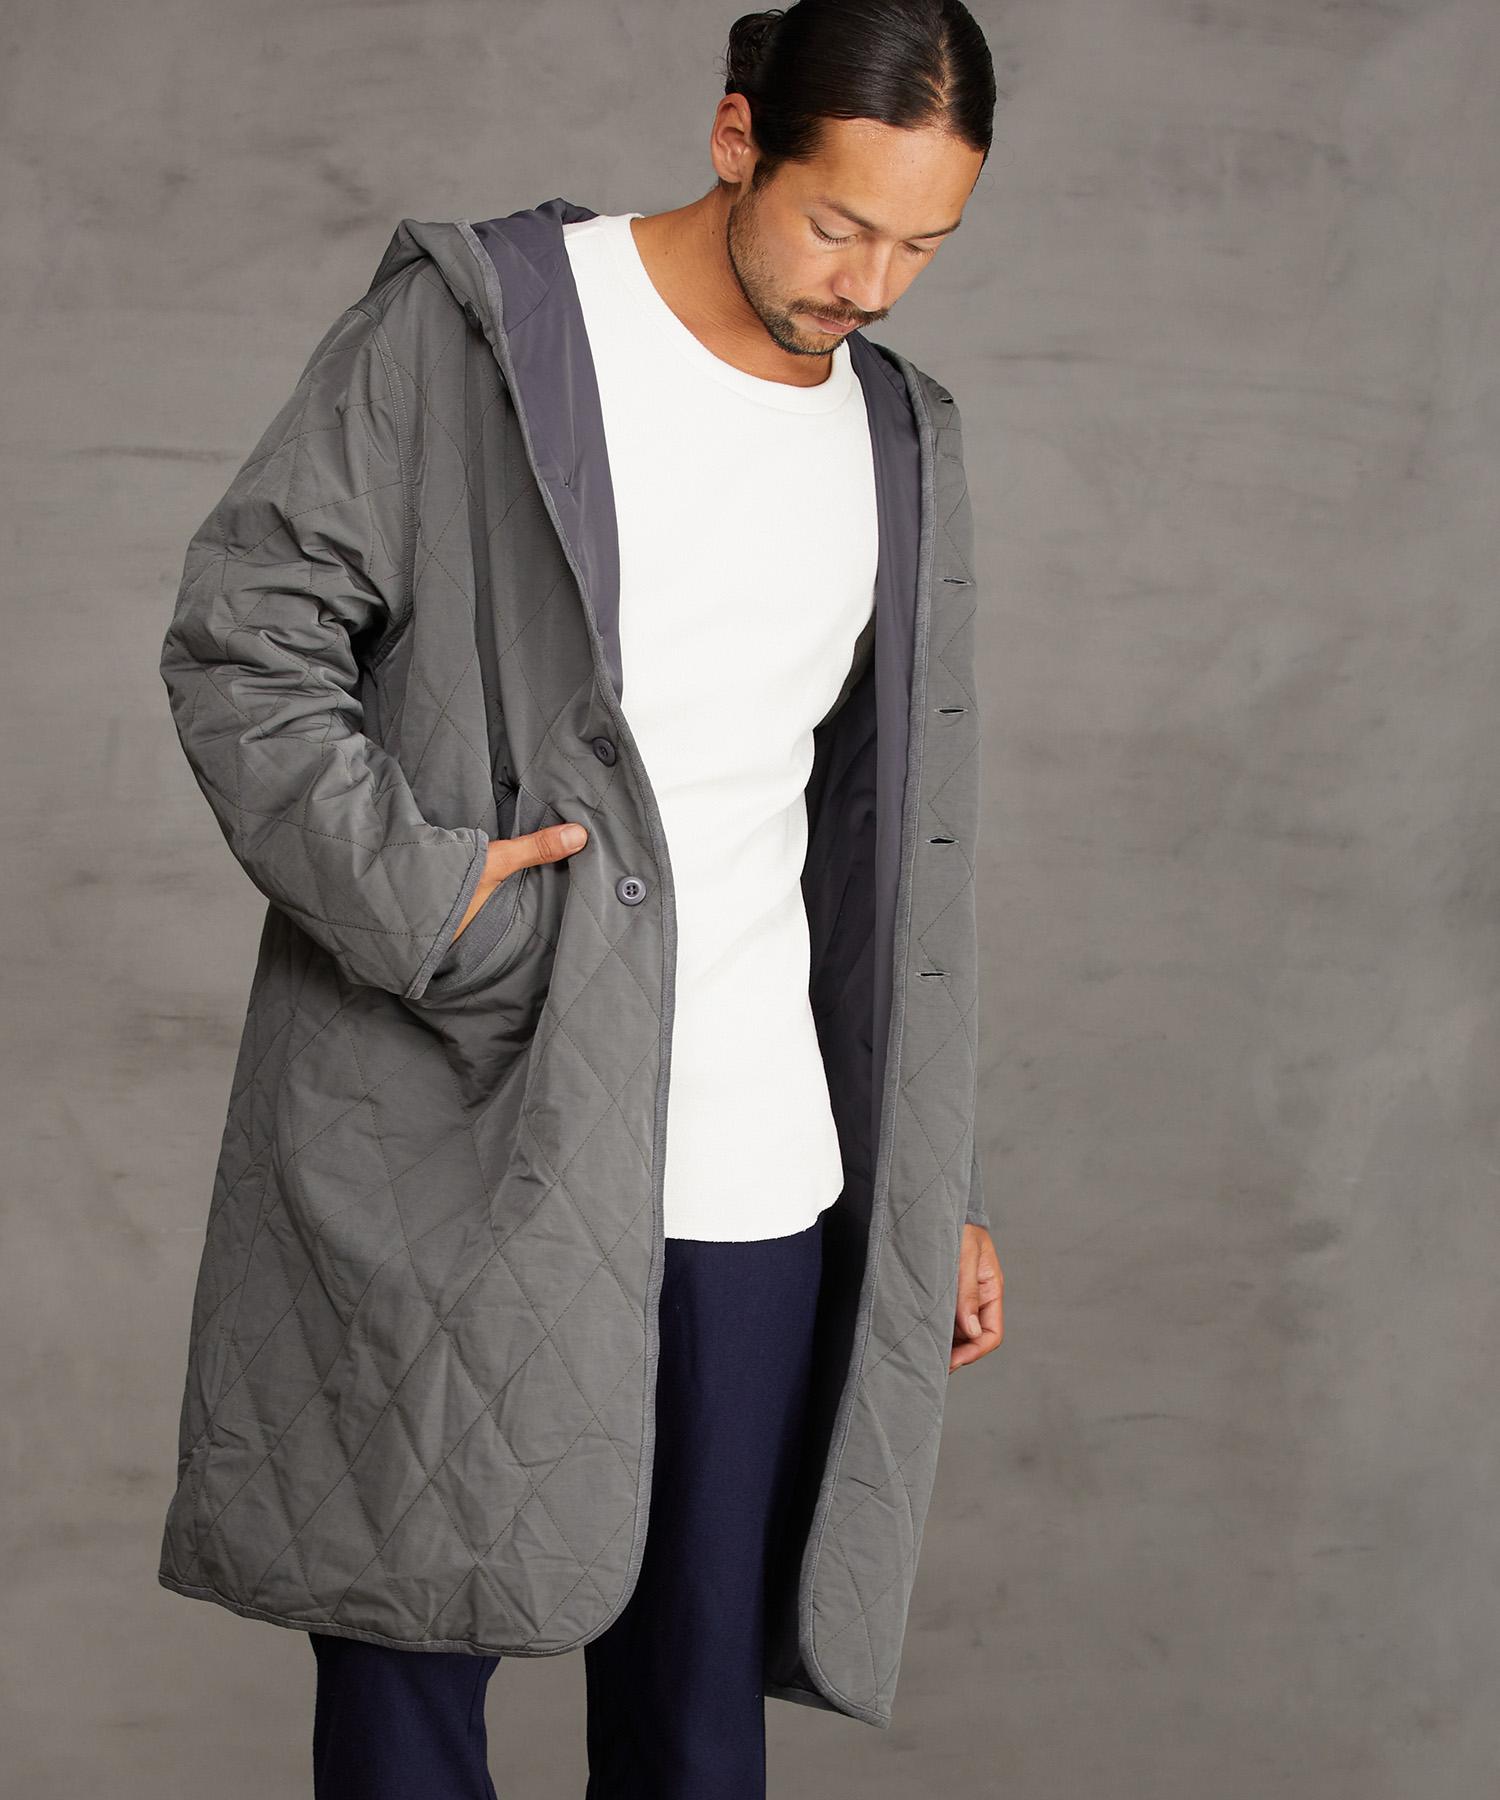 【CAMBIO(カンビオ)】【予約販売11月上旬~中旬入荷】Cotton Nylon Loose Fit Quilt Monster Coat コート